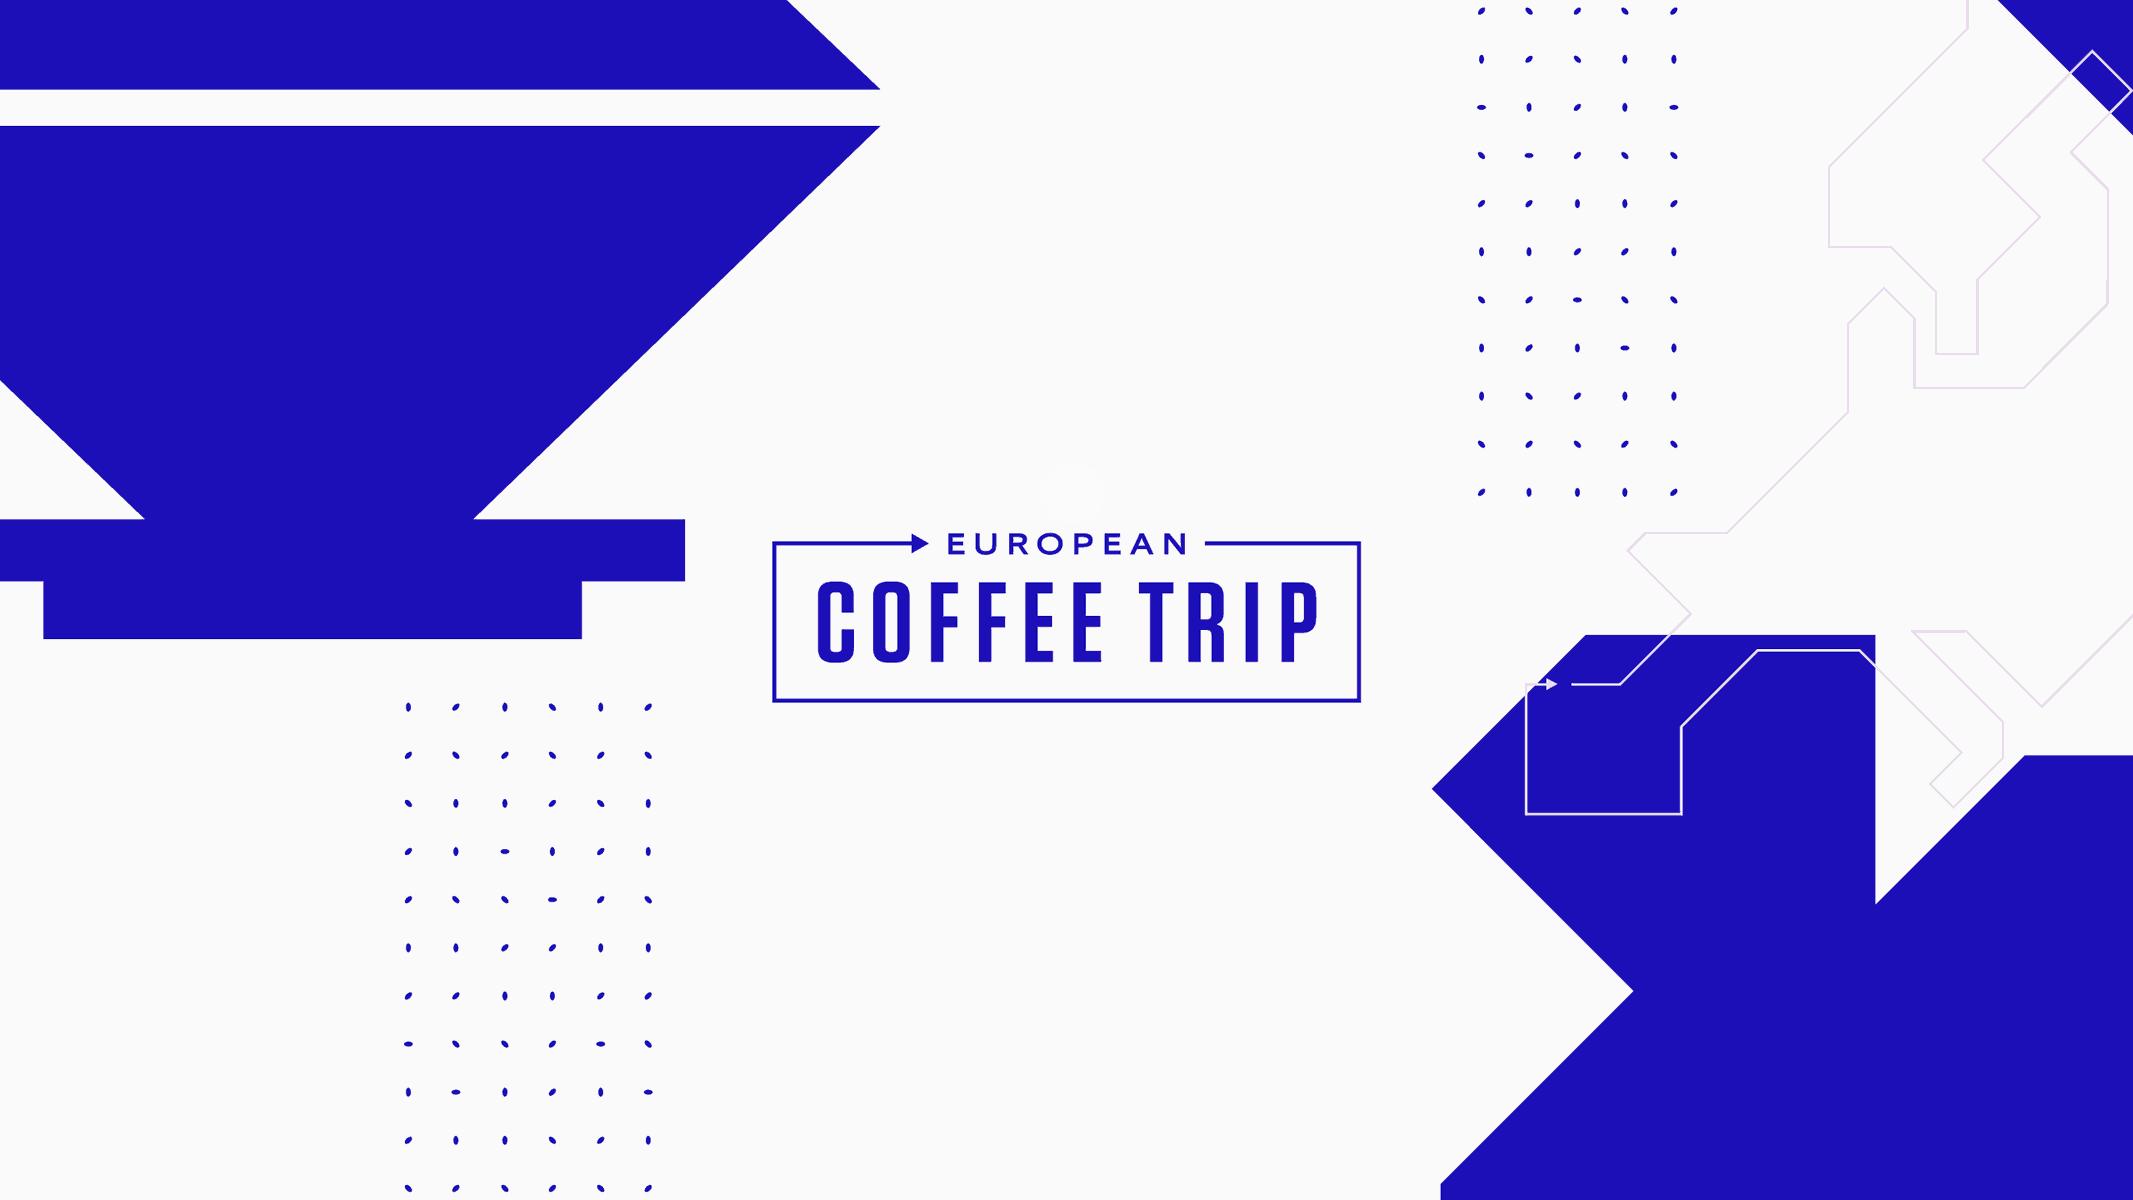 European Coffee Trip - YouTube